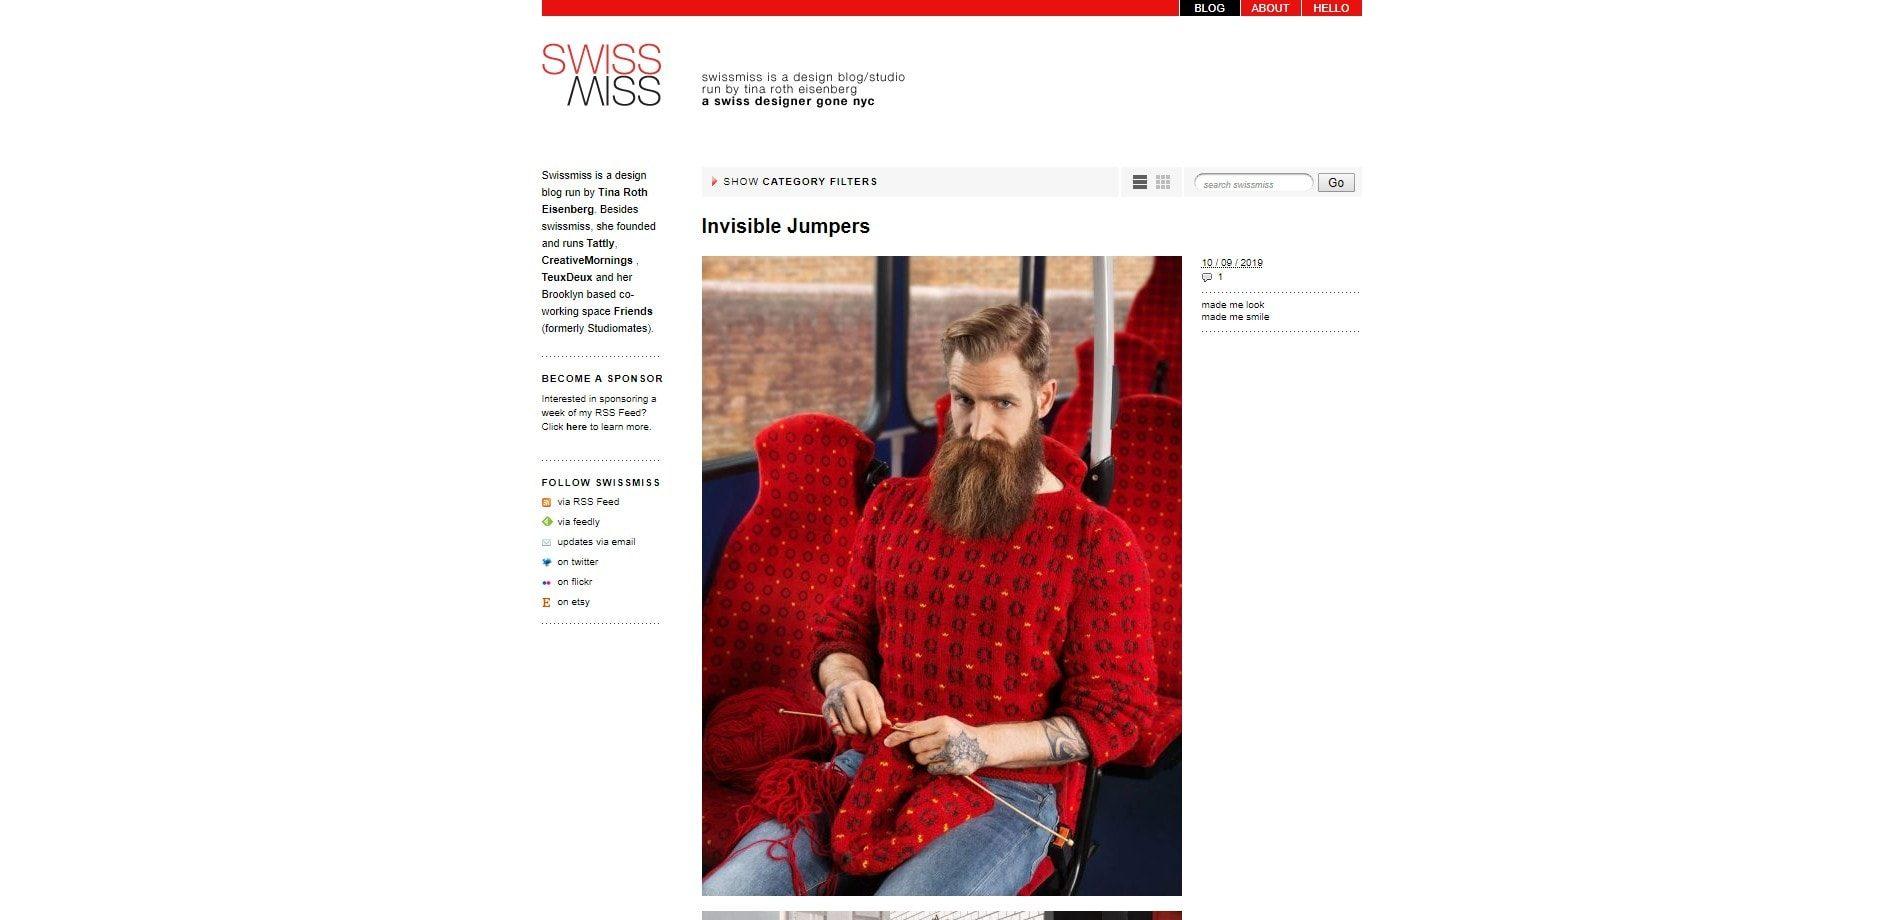 SwissMiss - Design blog